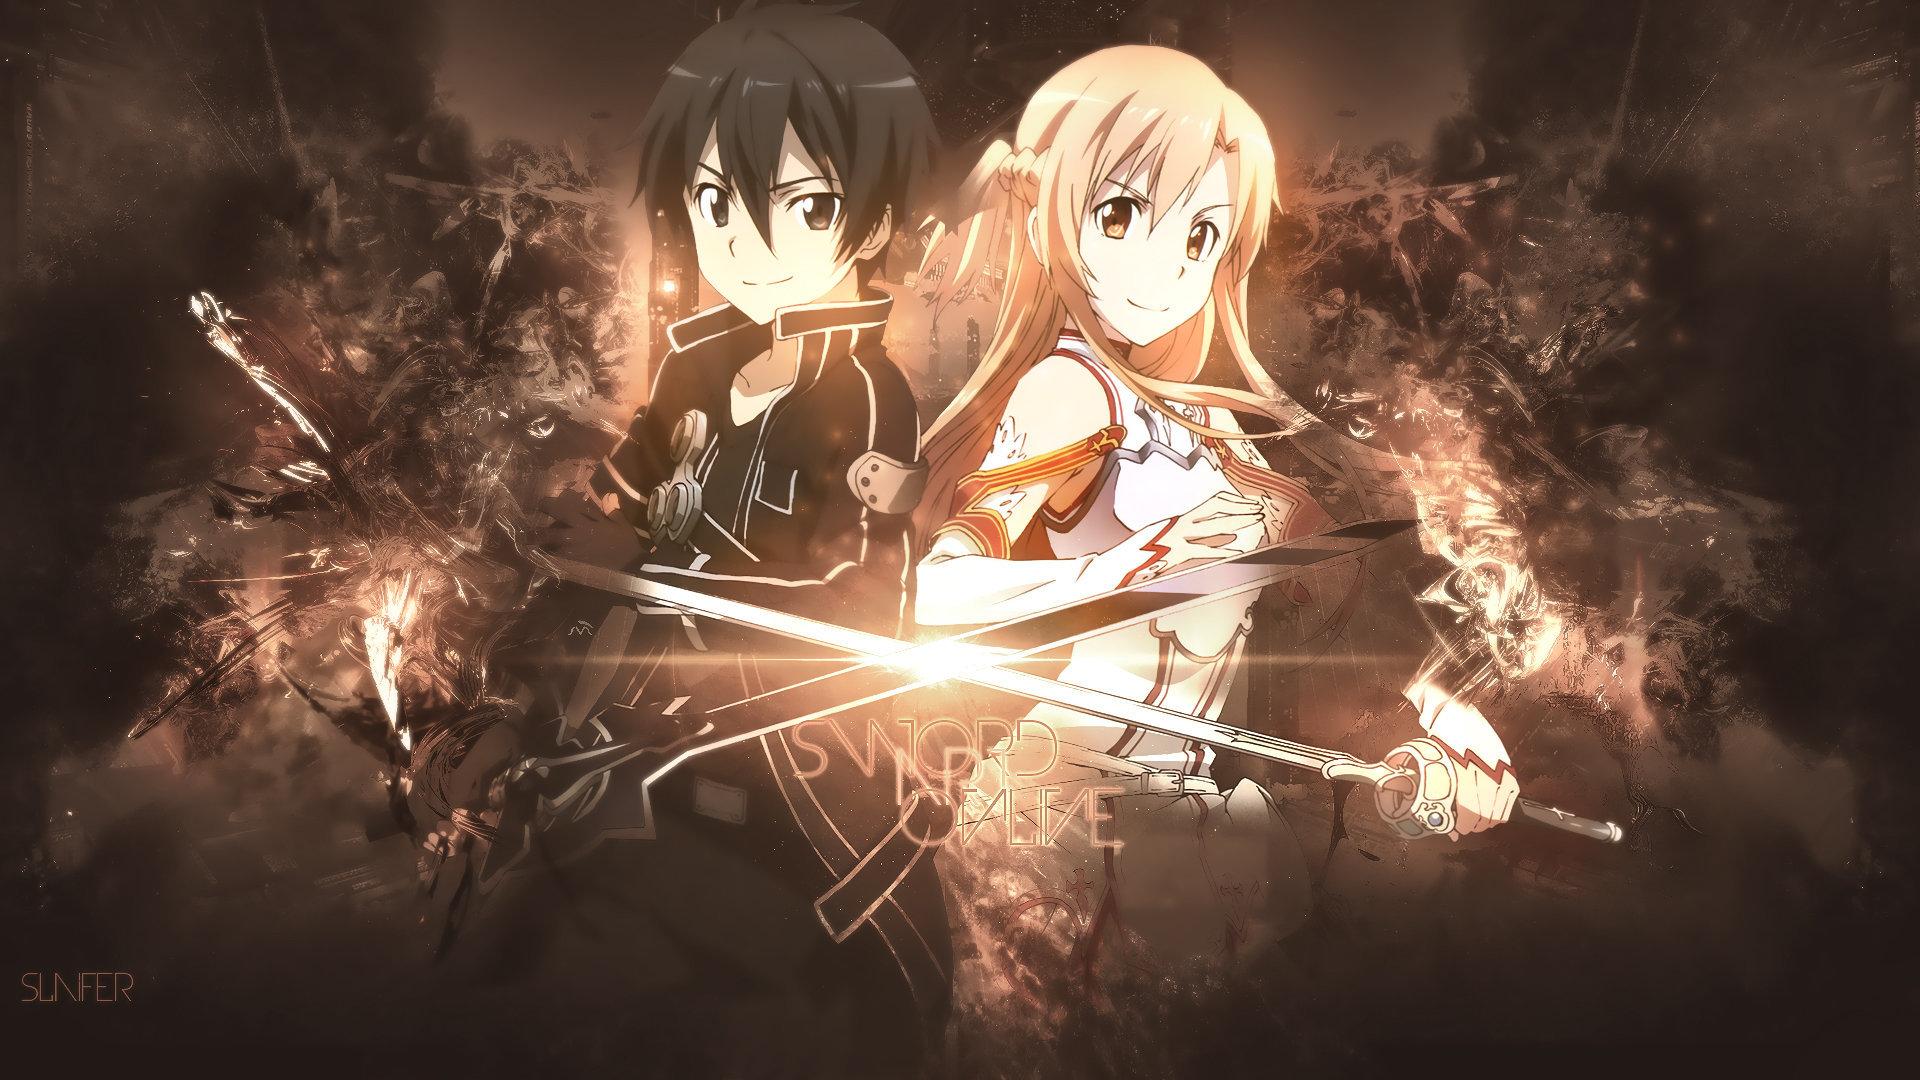 Best desktop background HD anime Anime Wallpaper HD Picture Live